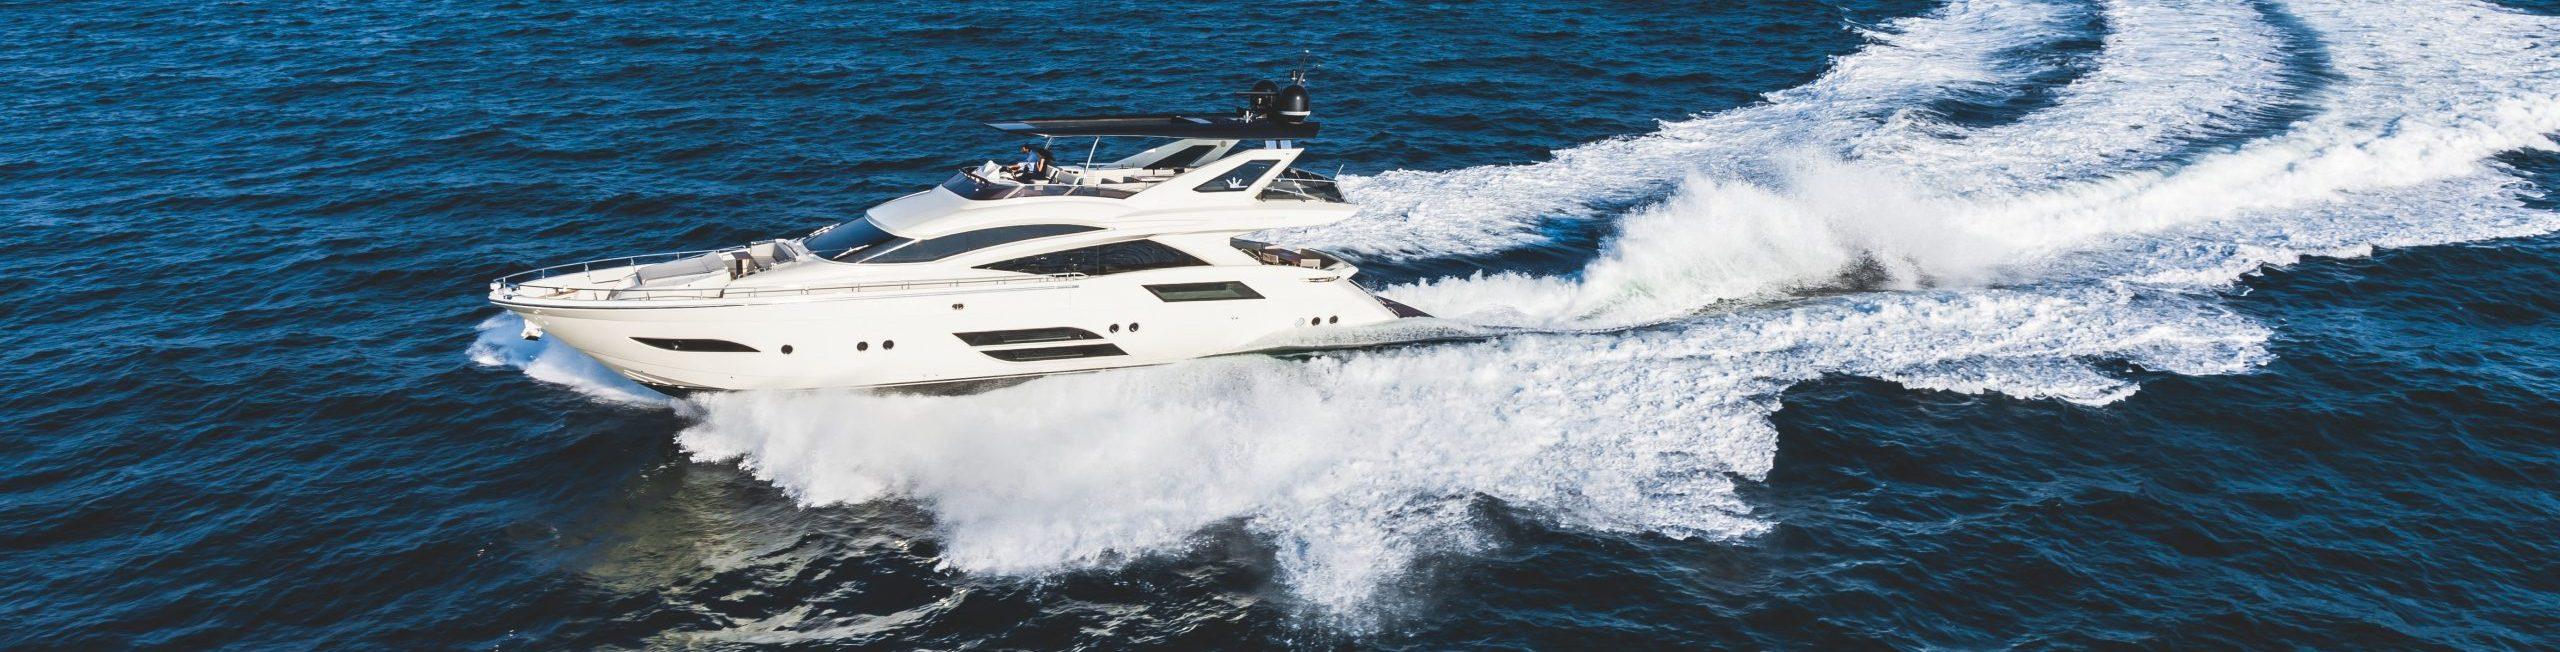 Balearic Marine Cluster une fuerzas con Balearic Yacht Destination